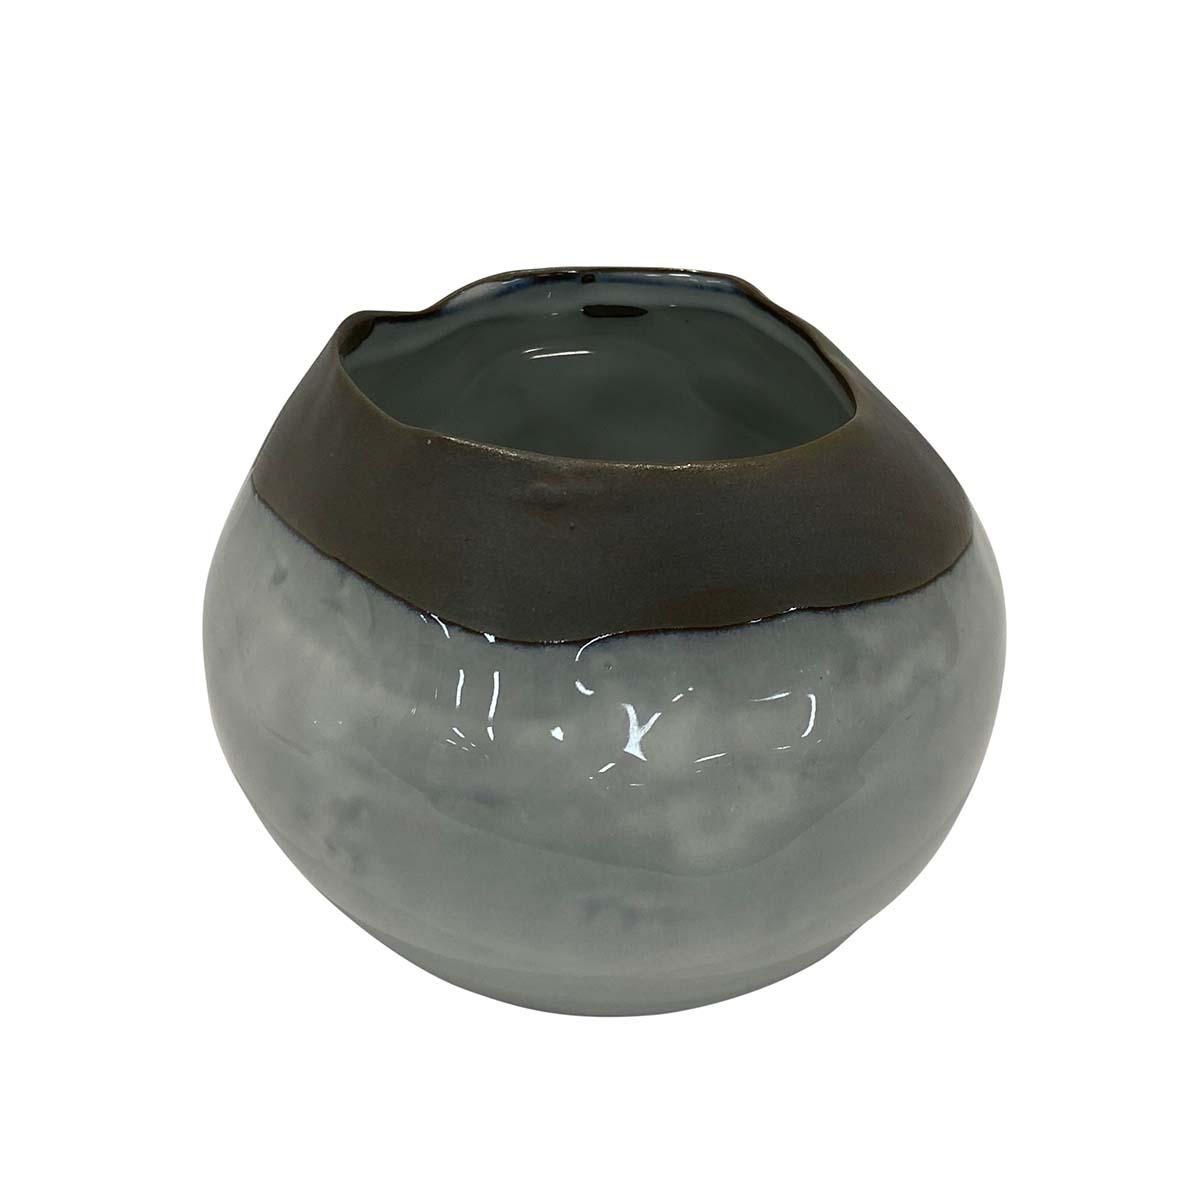 Indigo Halo Vase 14x10cm in Ceramic